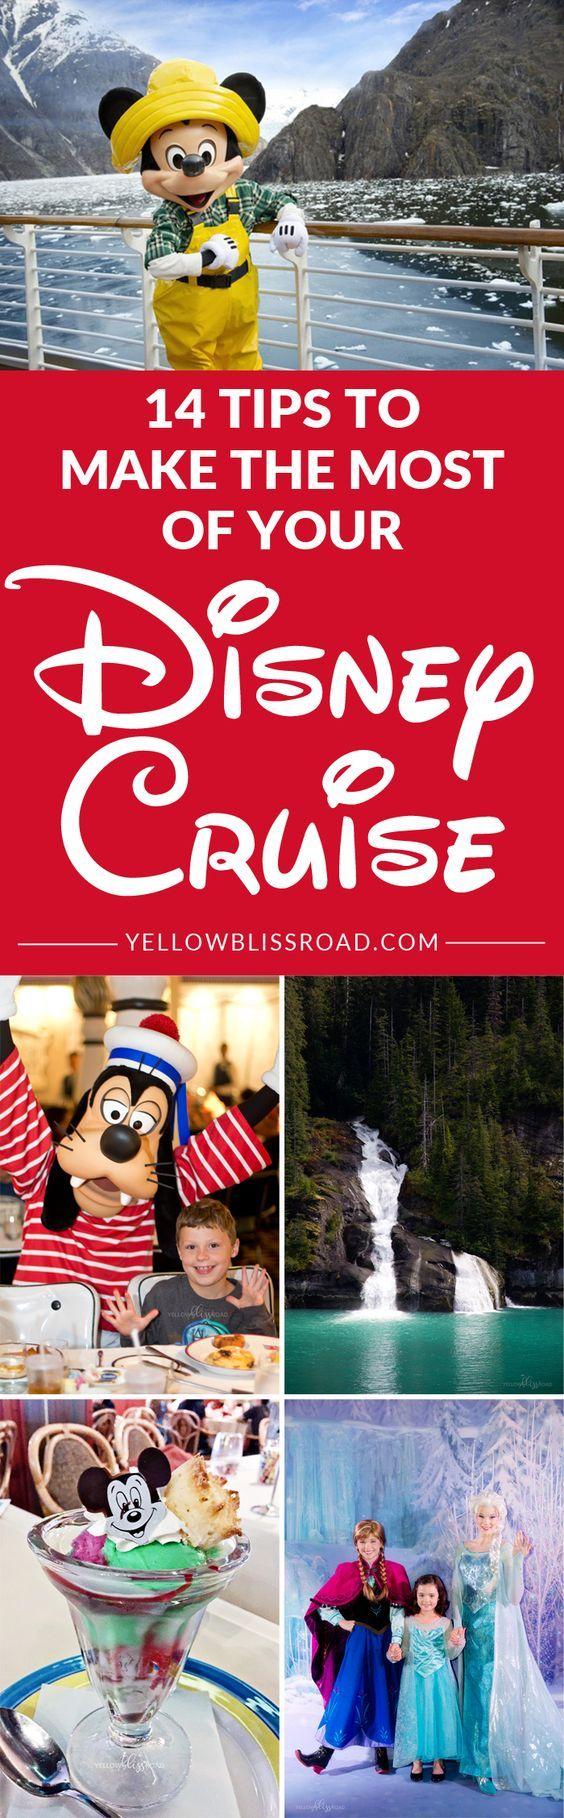 14 Tips for a Magical Disney Cruise to Alaska